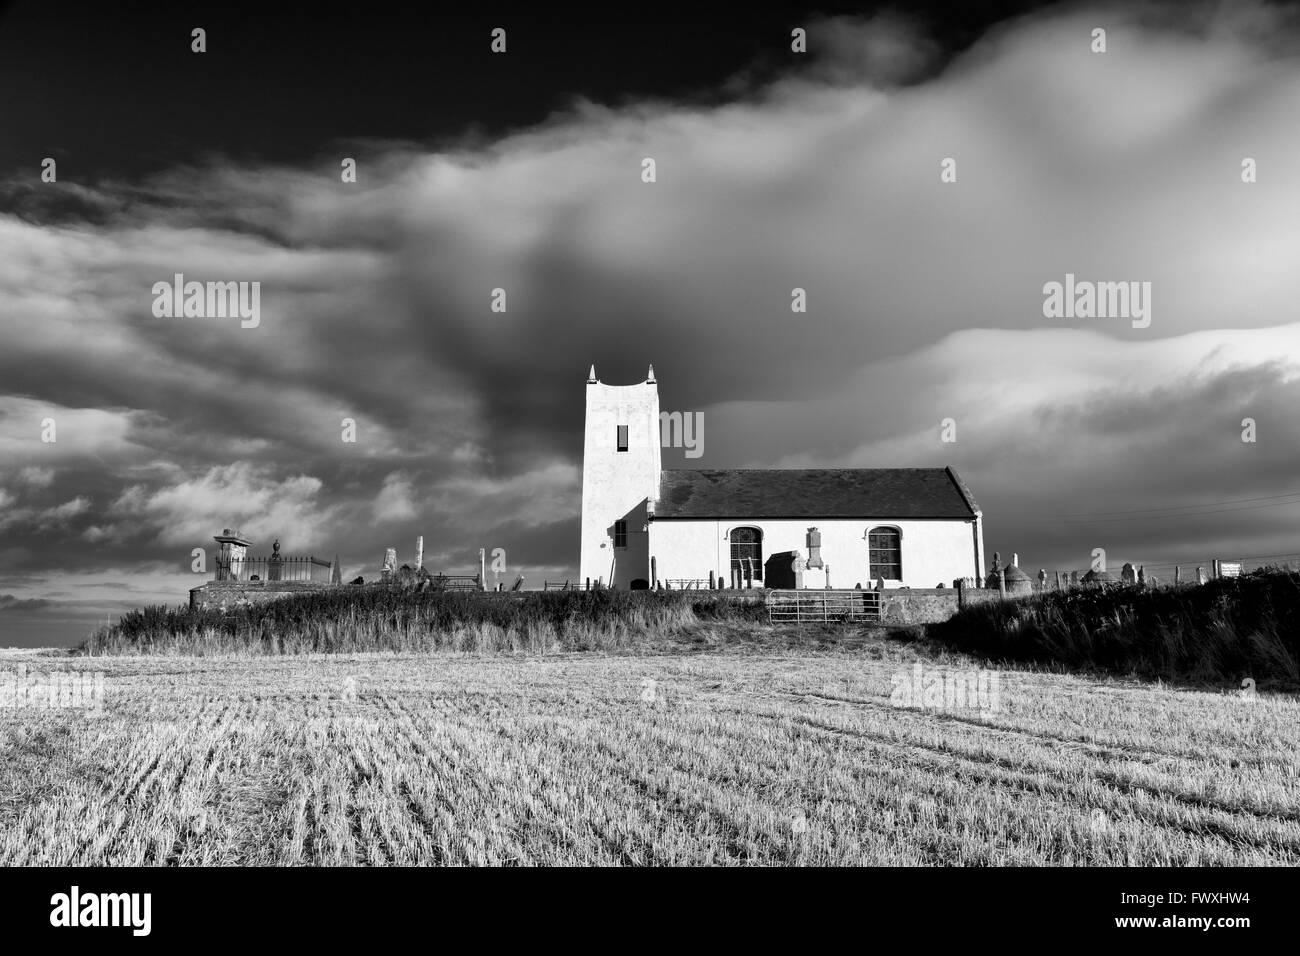 Ballintoy Church, Ballintoy Village, County Antrim, Ulster, Northern Ireland, Europe - Stock Image